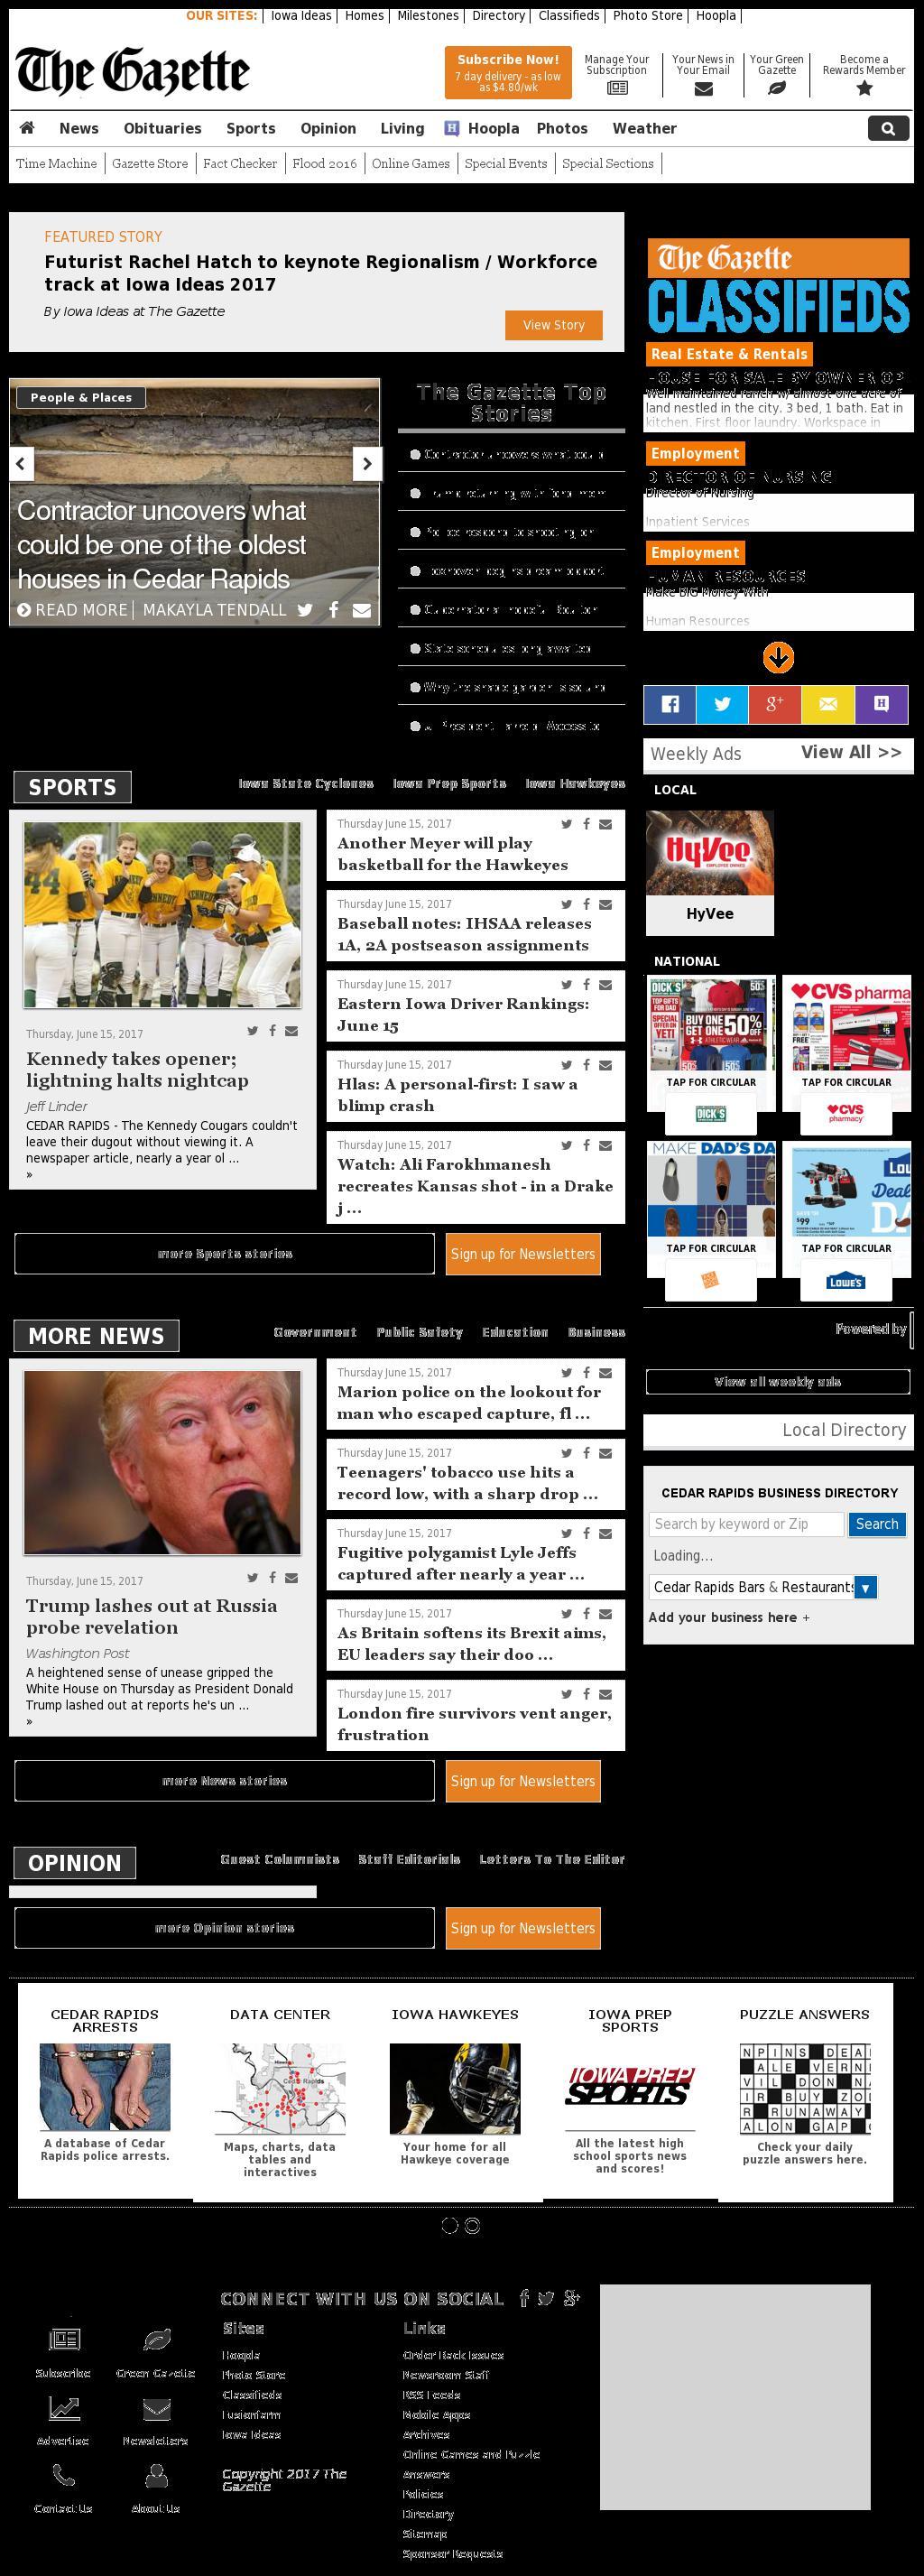 The (Cedar Rapids) Gazette at Friday June 16, 2017, 9:06 a.m. UTC